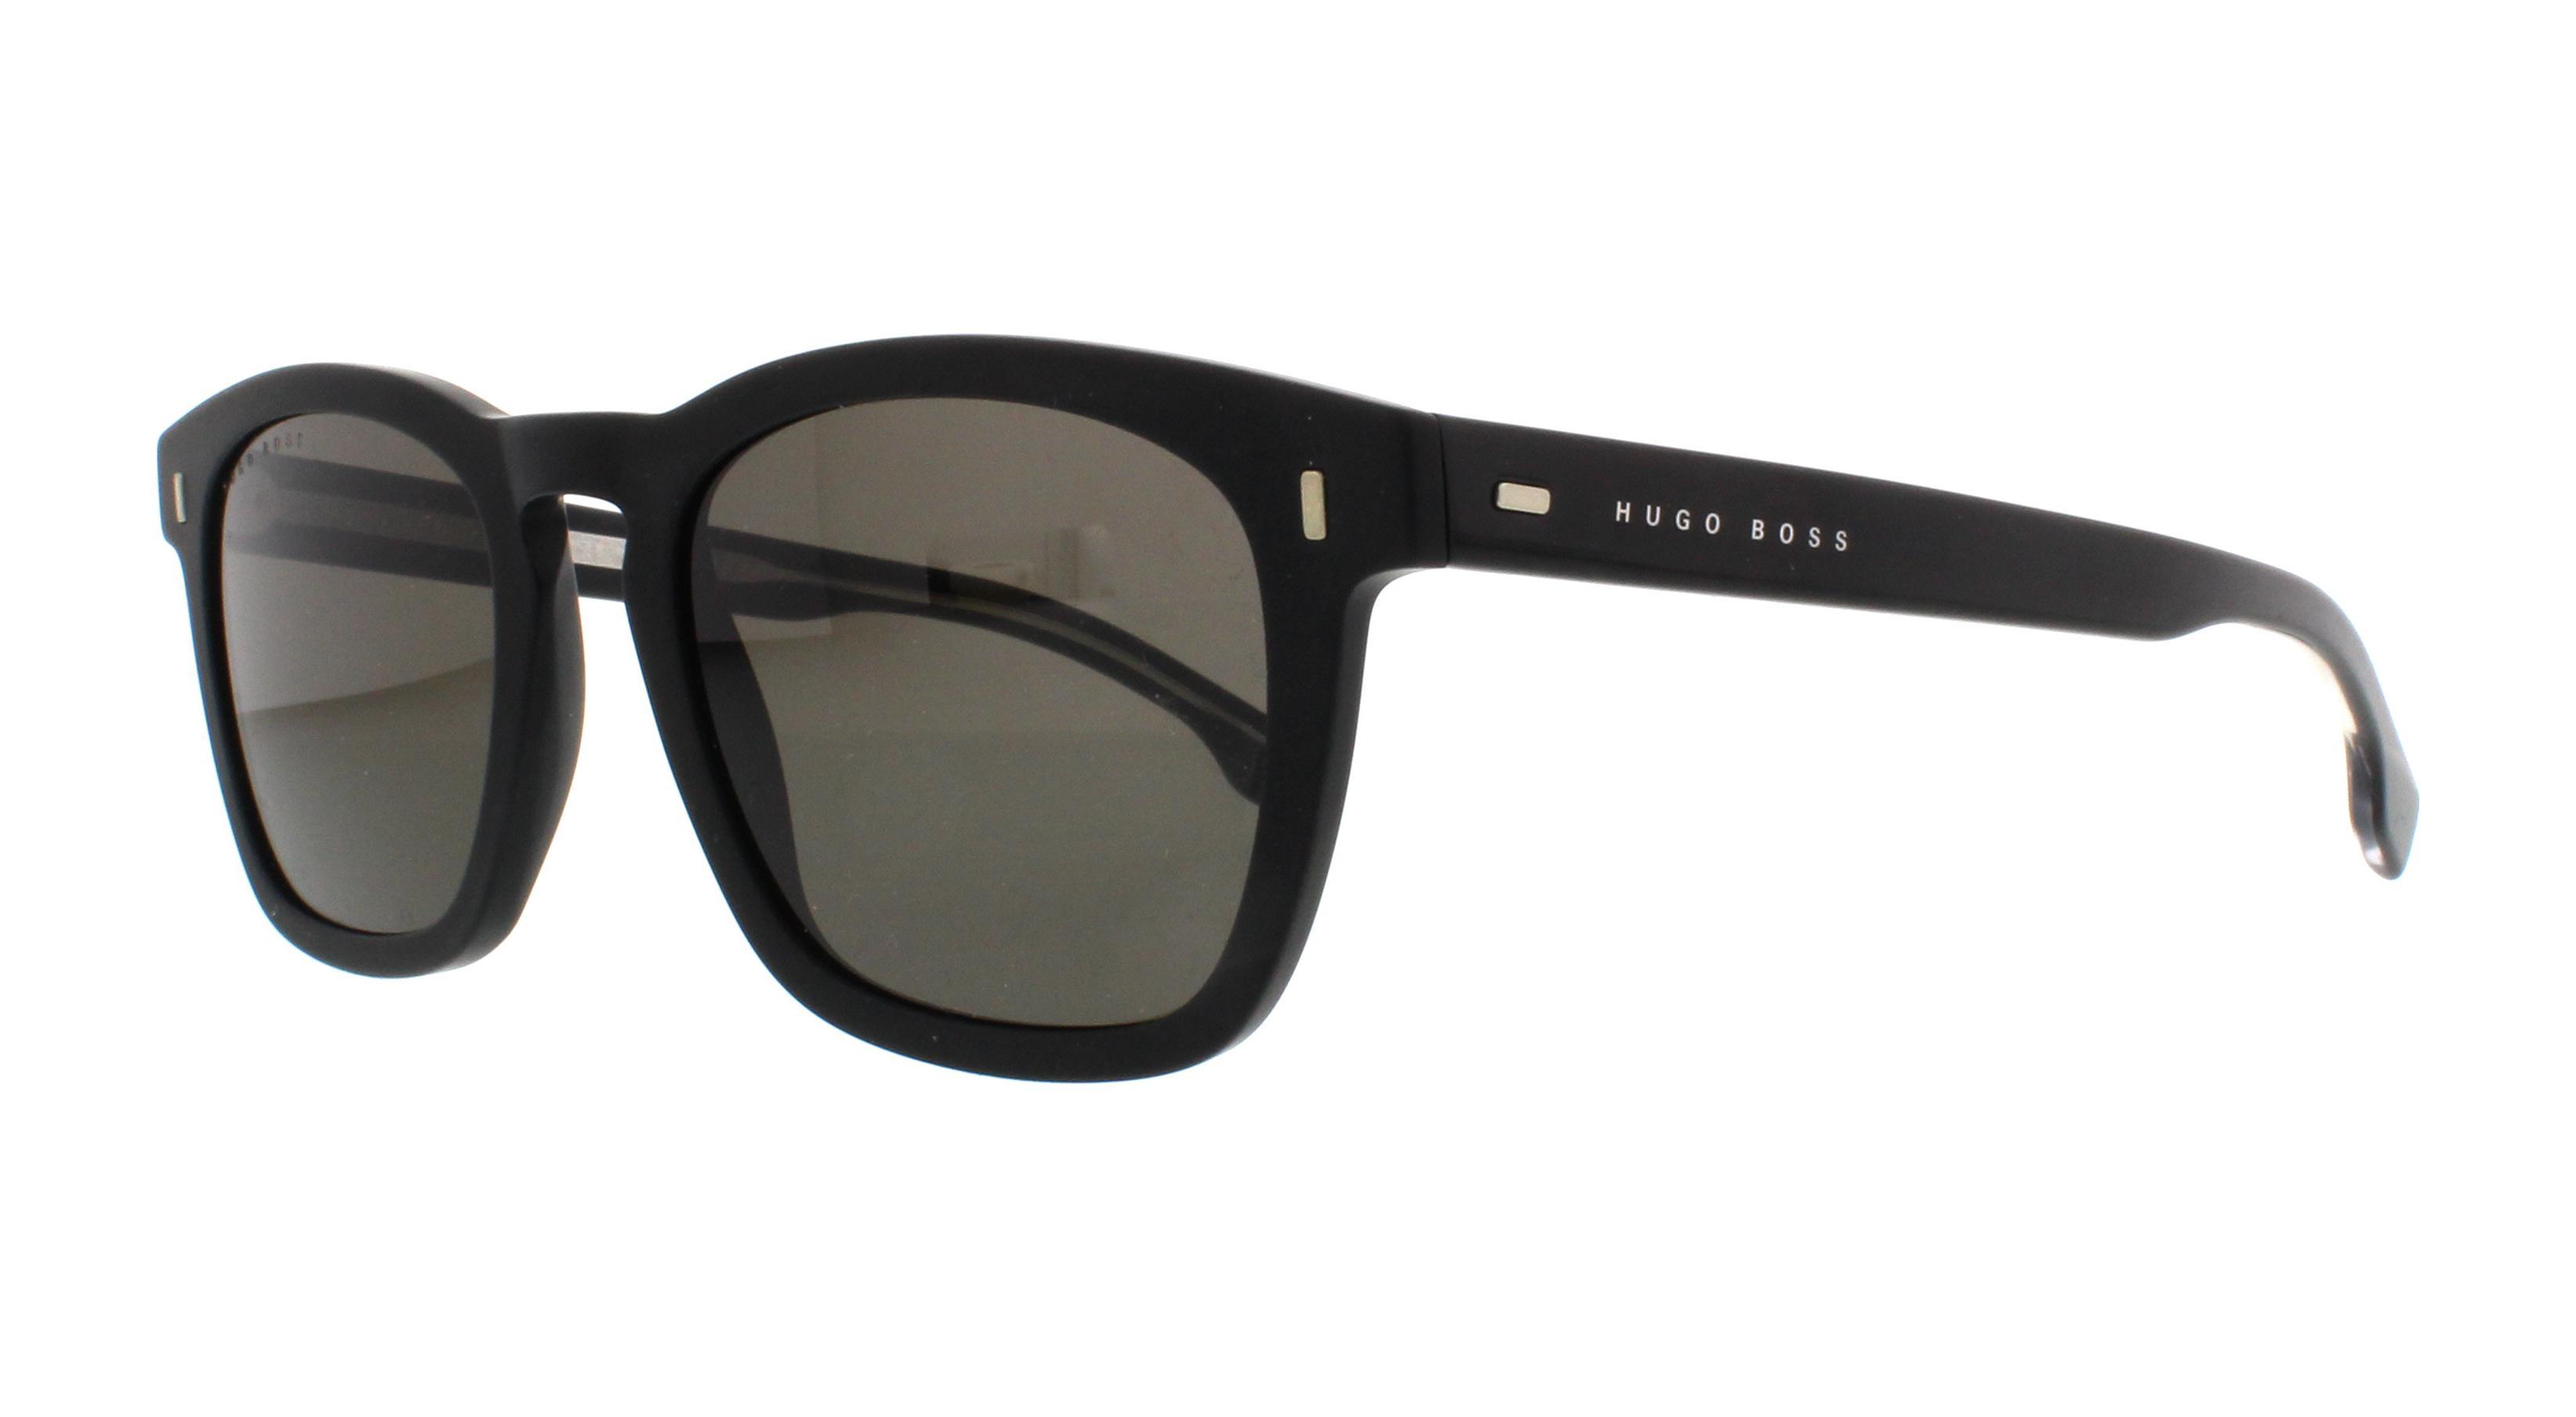 dc804f01666 HUGO BOSS Sunglasses 0926 S 0003 Matte Black 51MM 762753492159